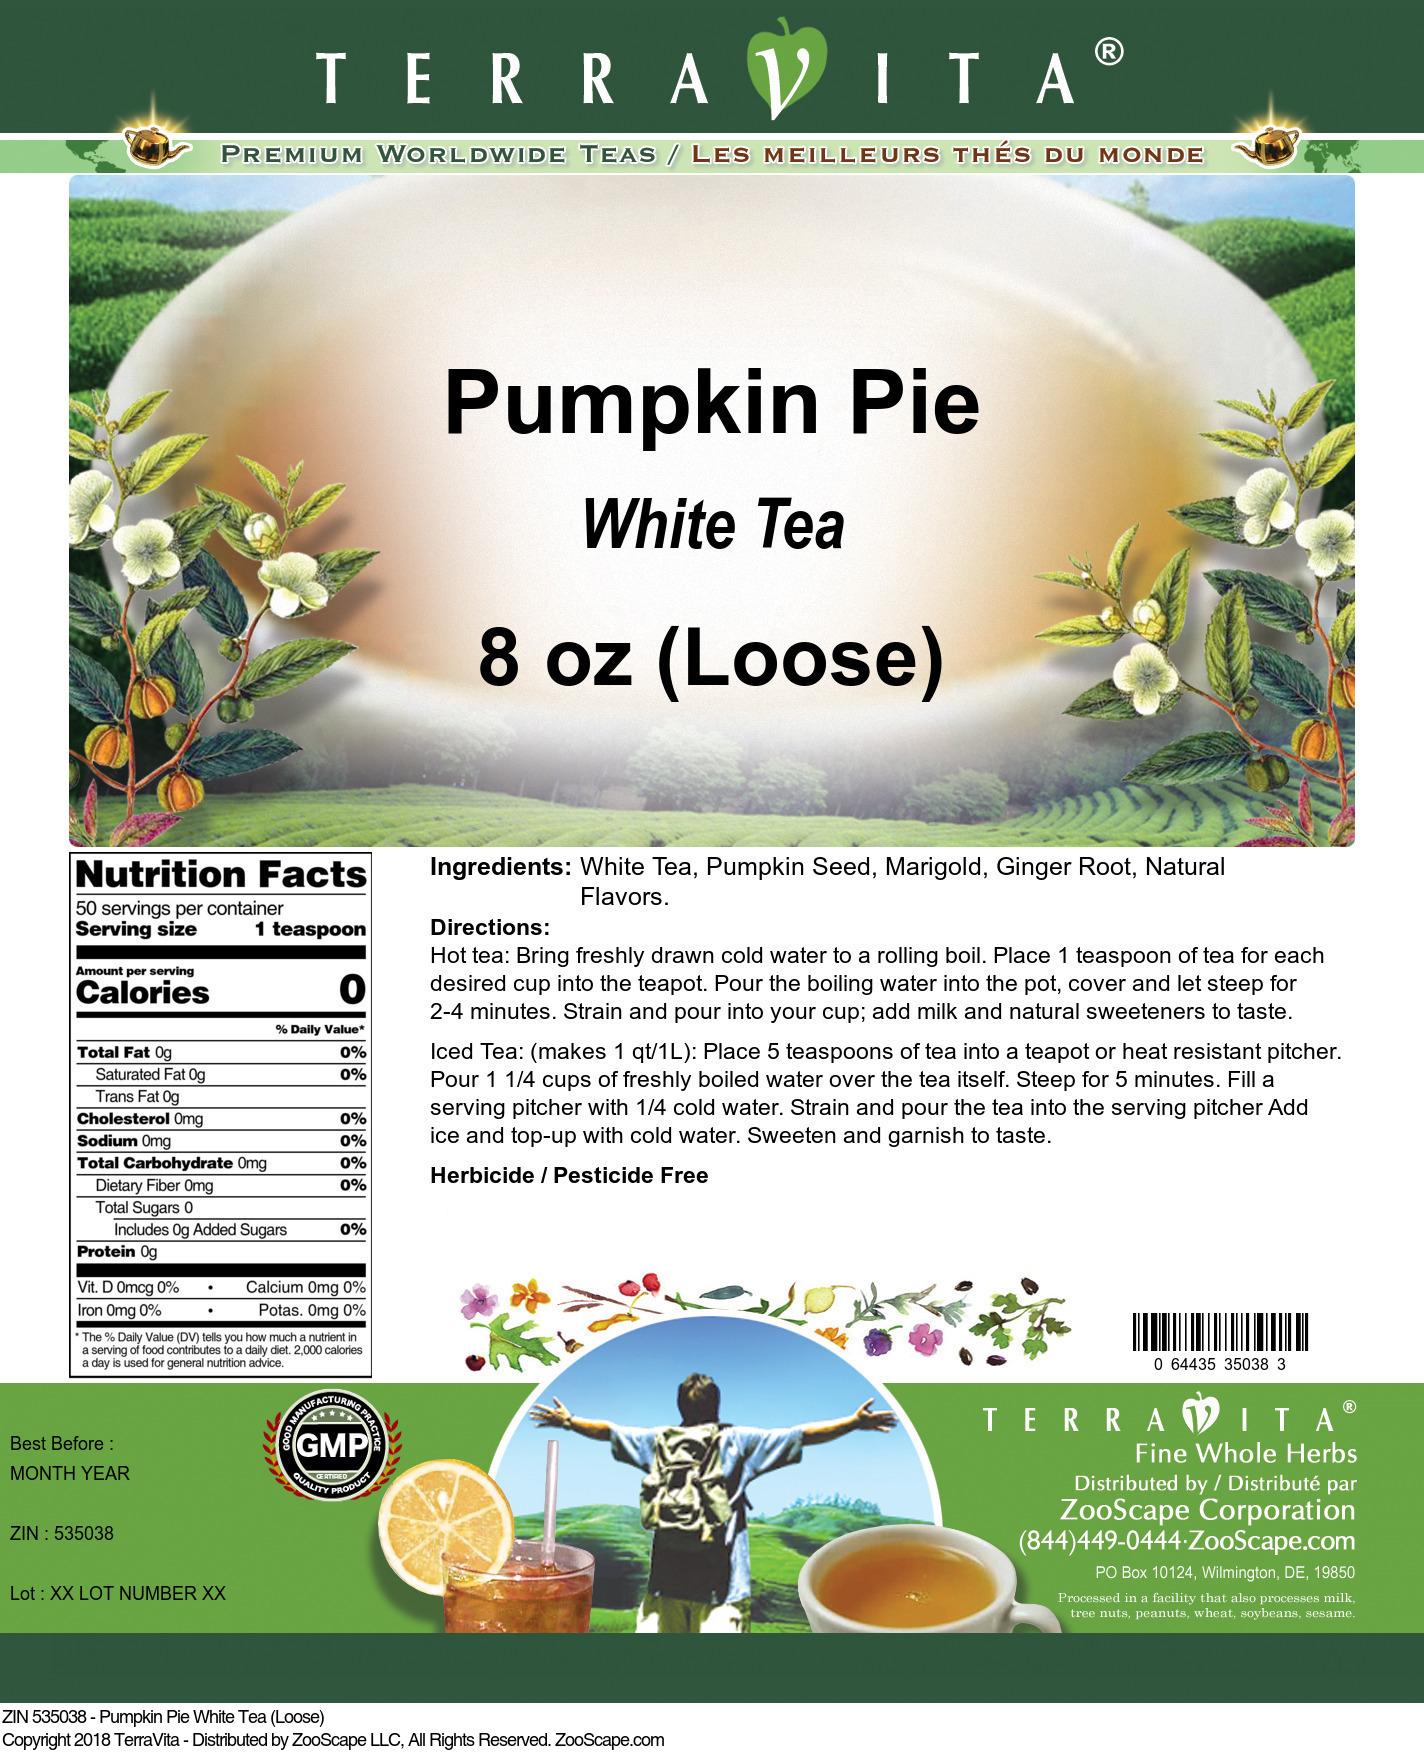 Pumpkin Pie White Tea (Loose)